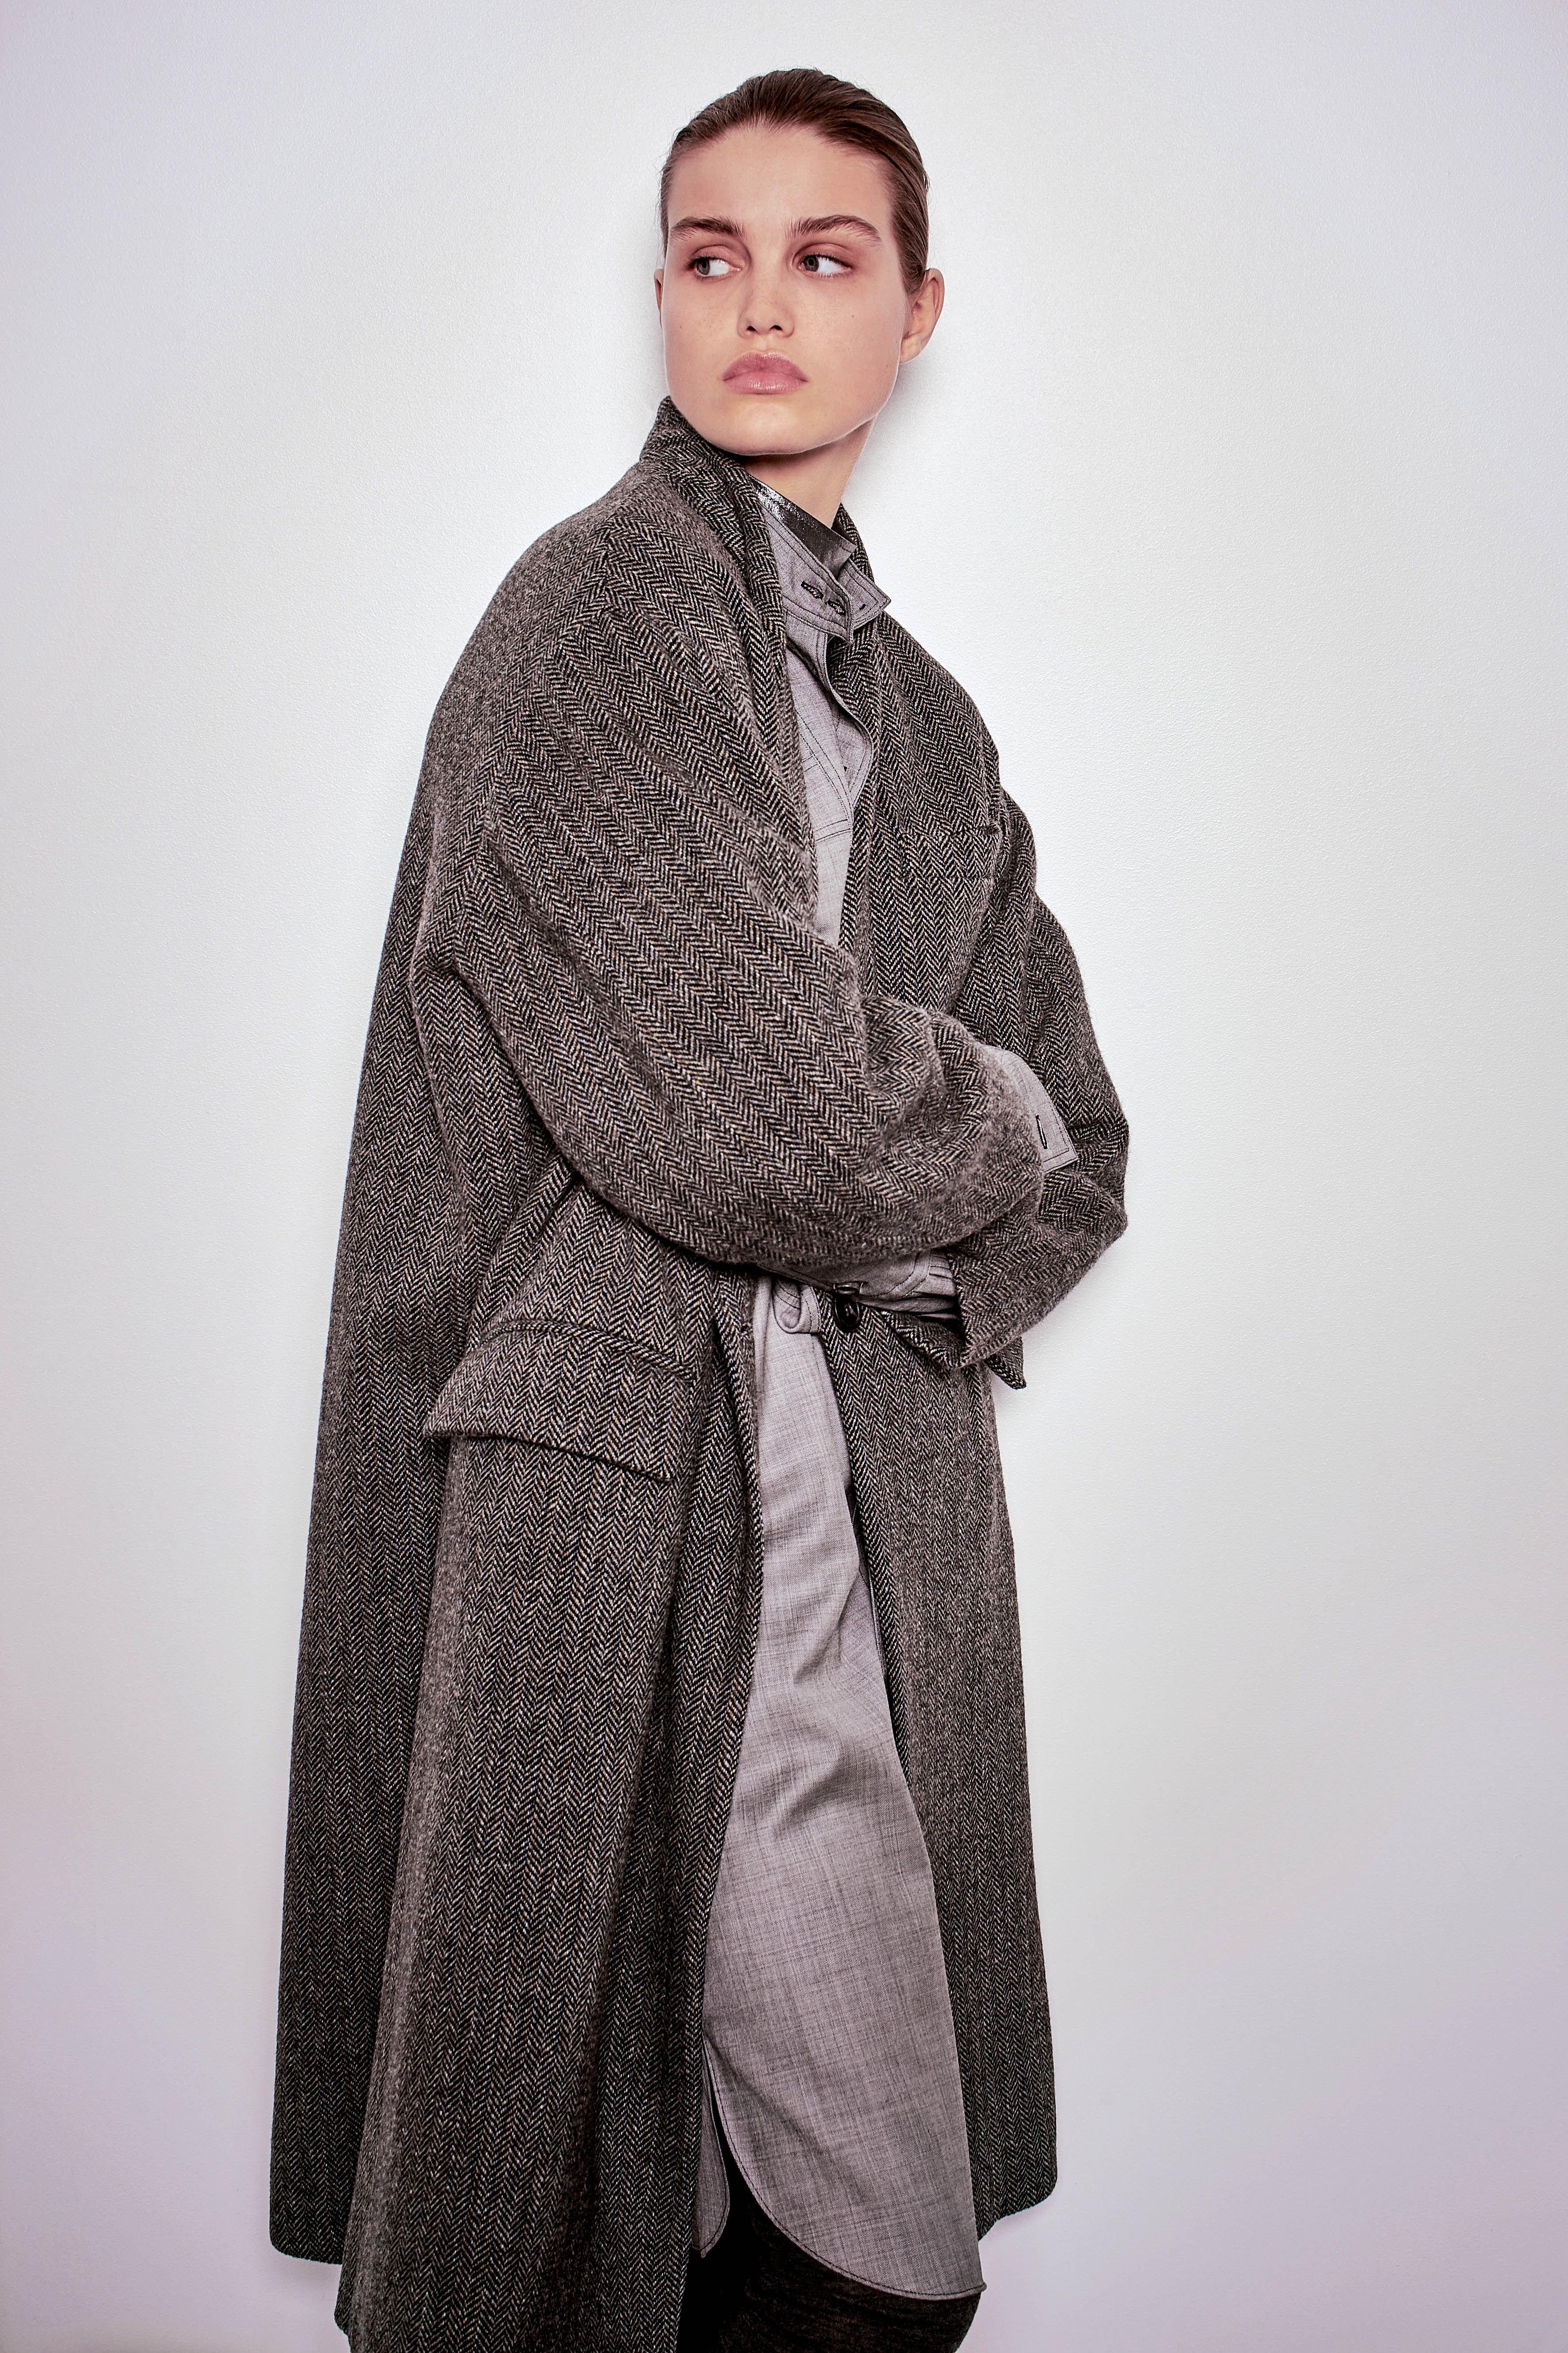 isabel marant etoile fall winter 39 16 henley coat grey also. Black Bedroom Furniture Sets. Home Design Ideas